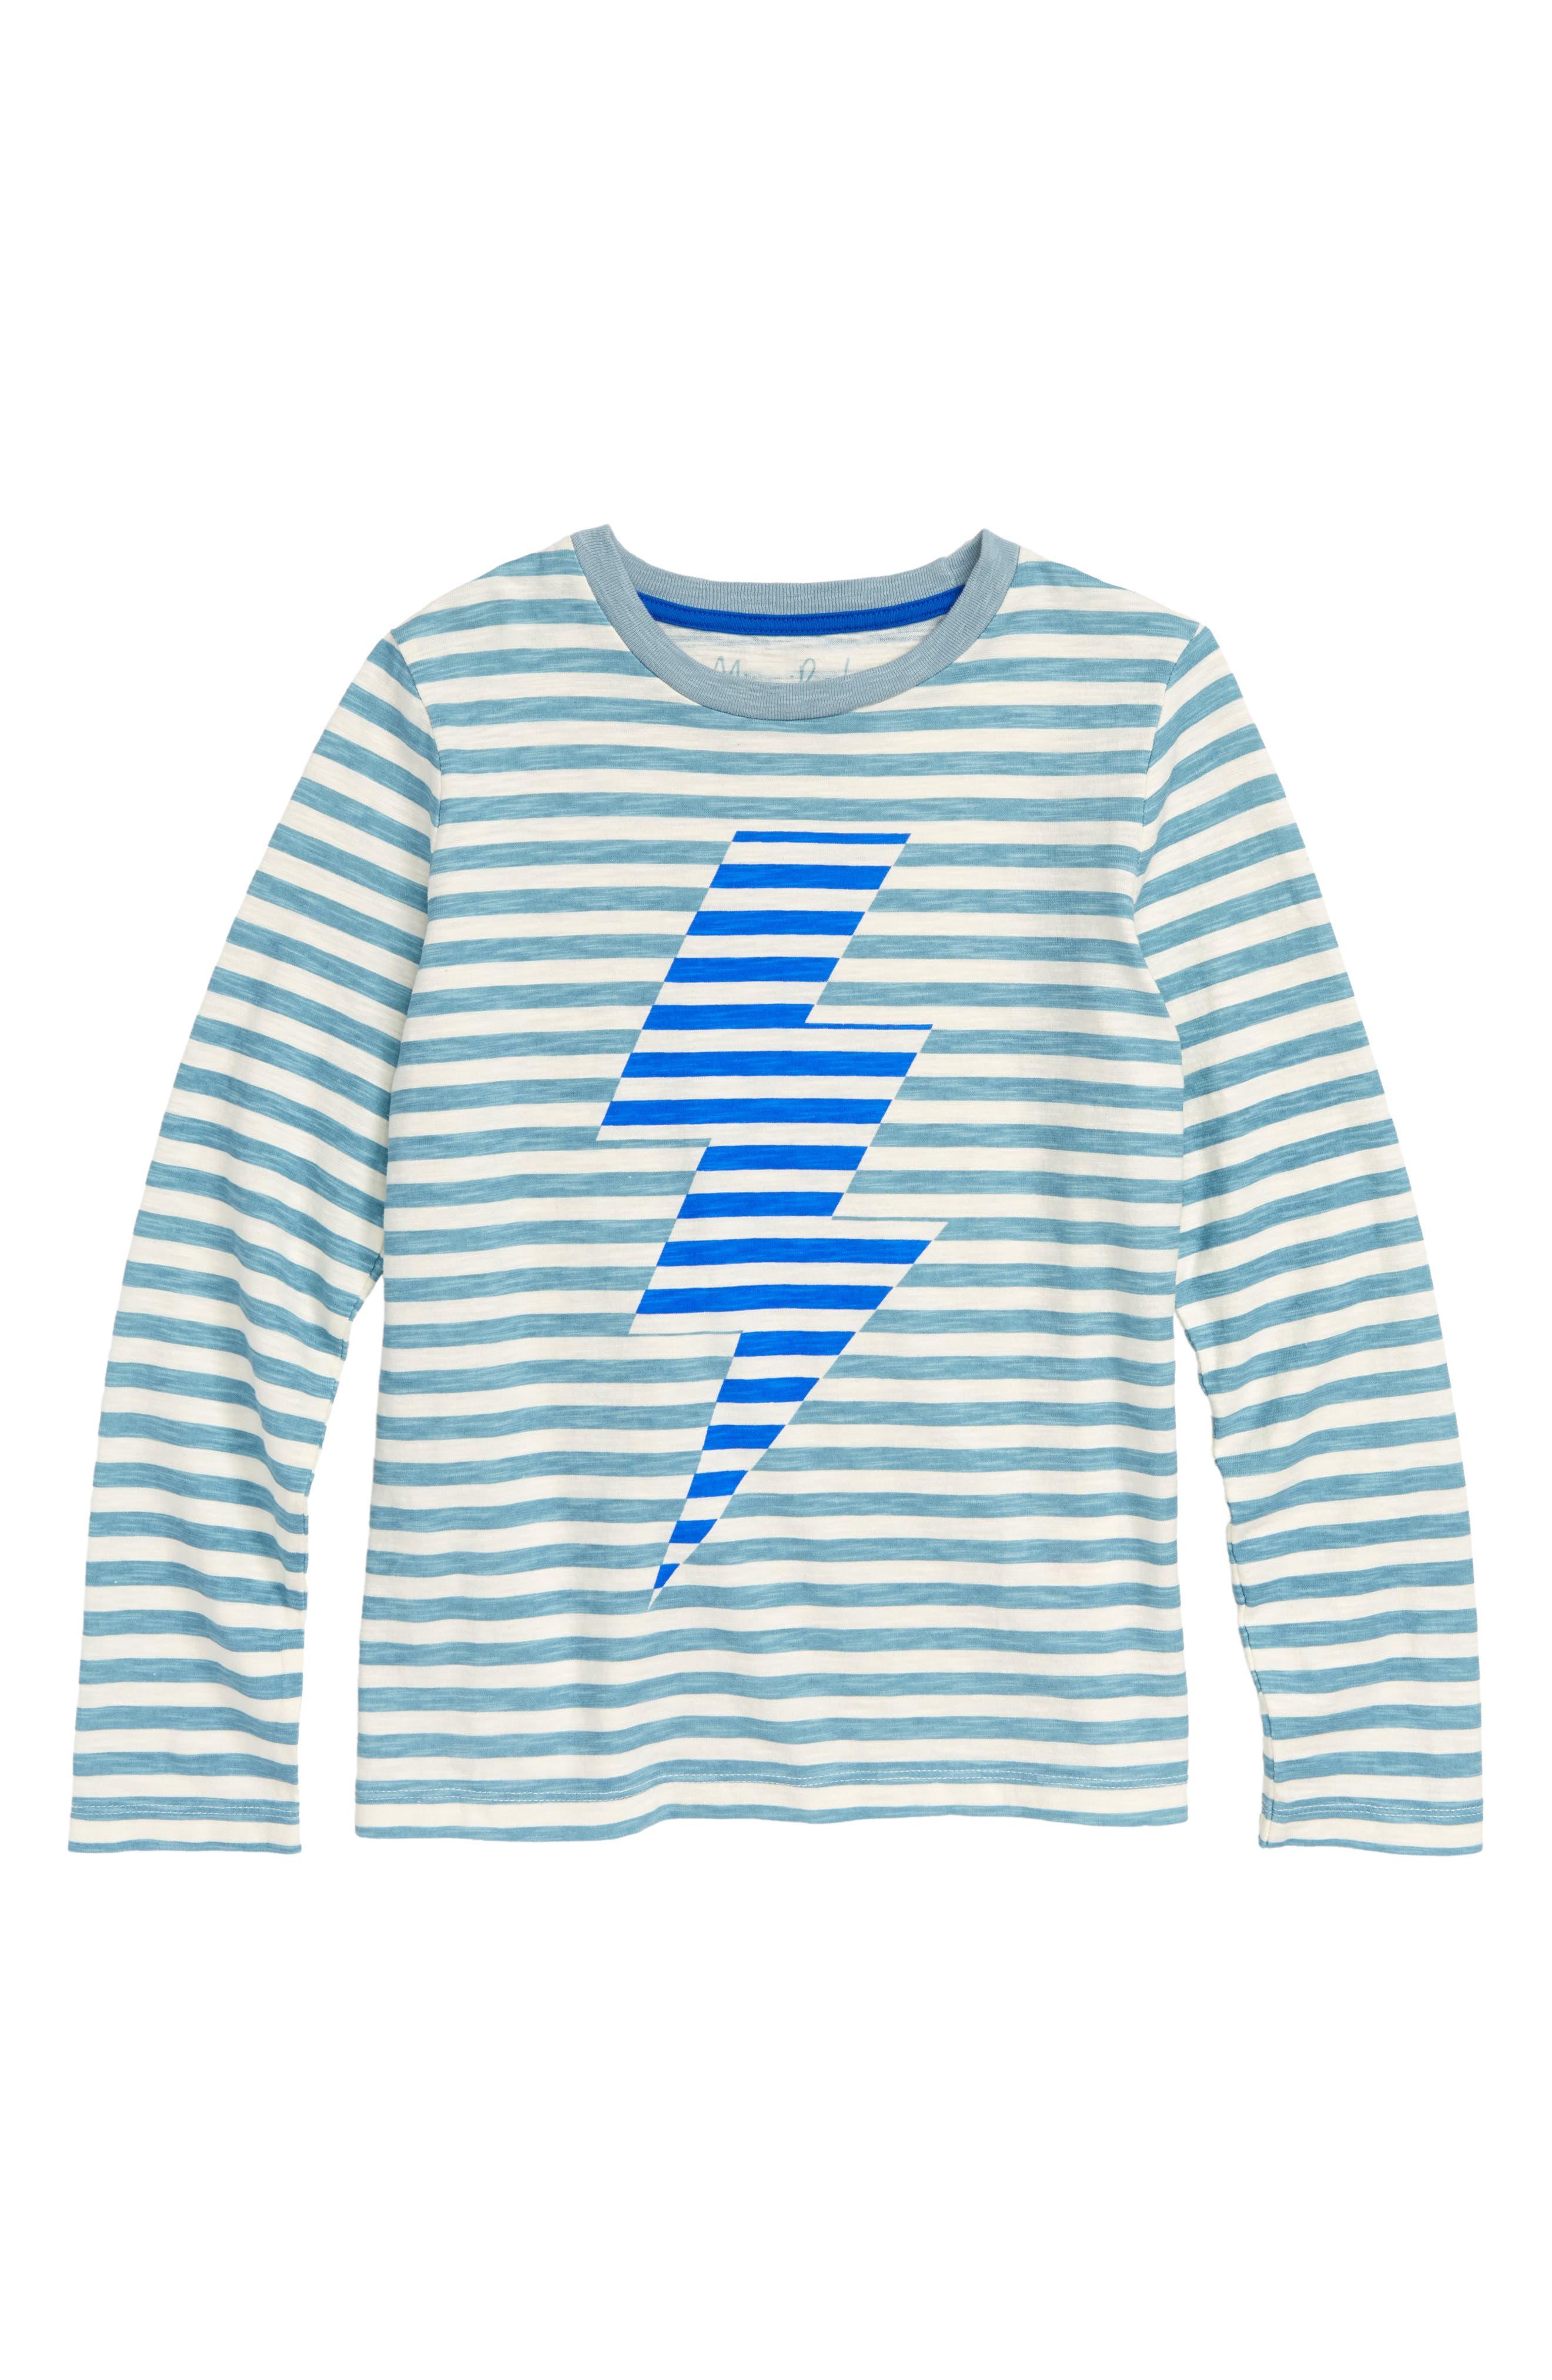 Stripy Bolt Icon T-Shirt,                             Main thumbnail 1, color,                             DOLPHIN BLUE/ ECRU